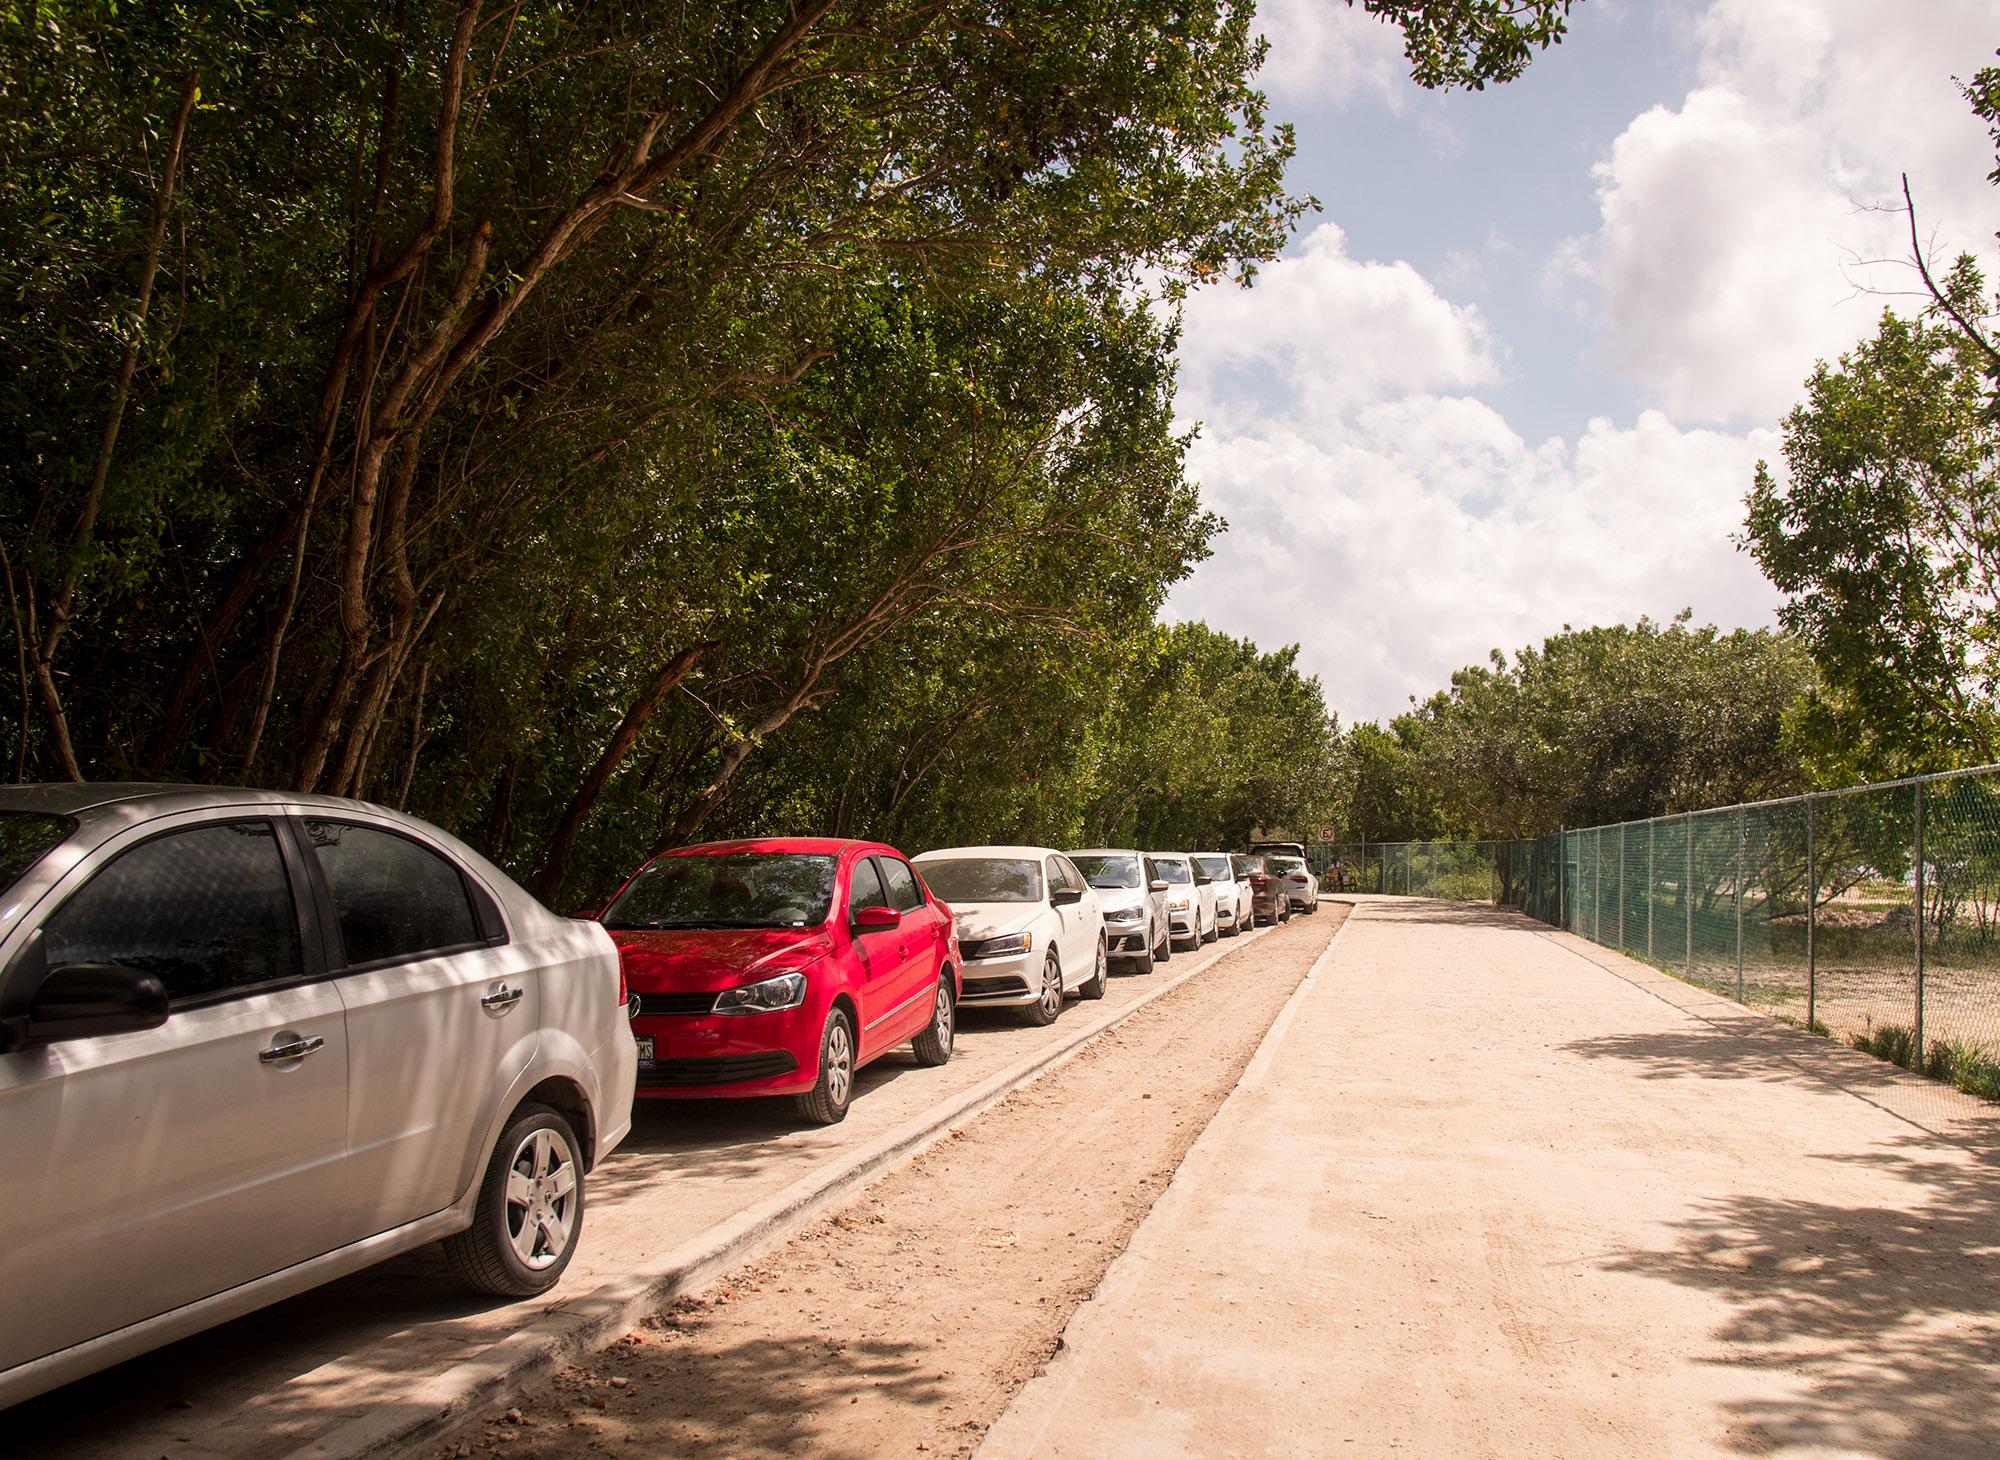 Parking at Playa Esmeralda